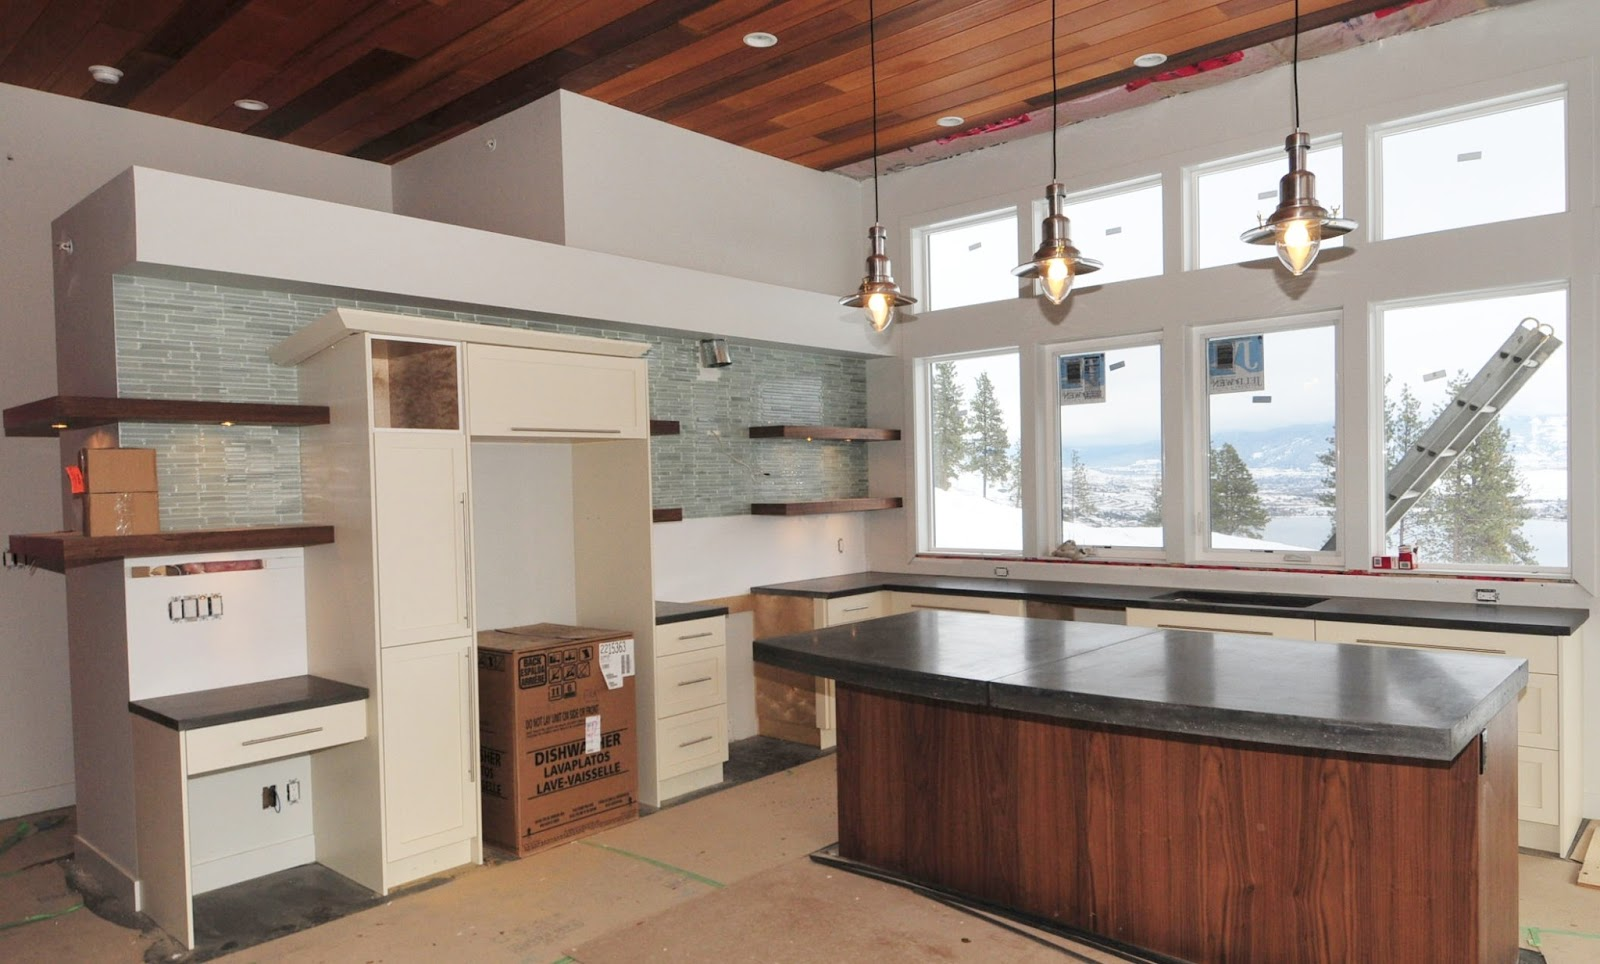 MODE CONCRETE: Modern Kitchen with Concrete Countertops ...